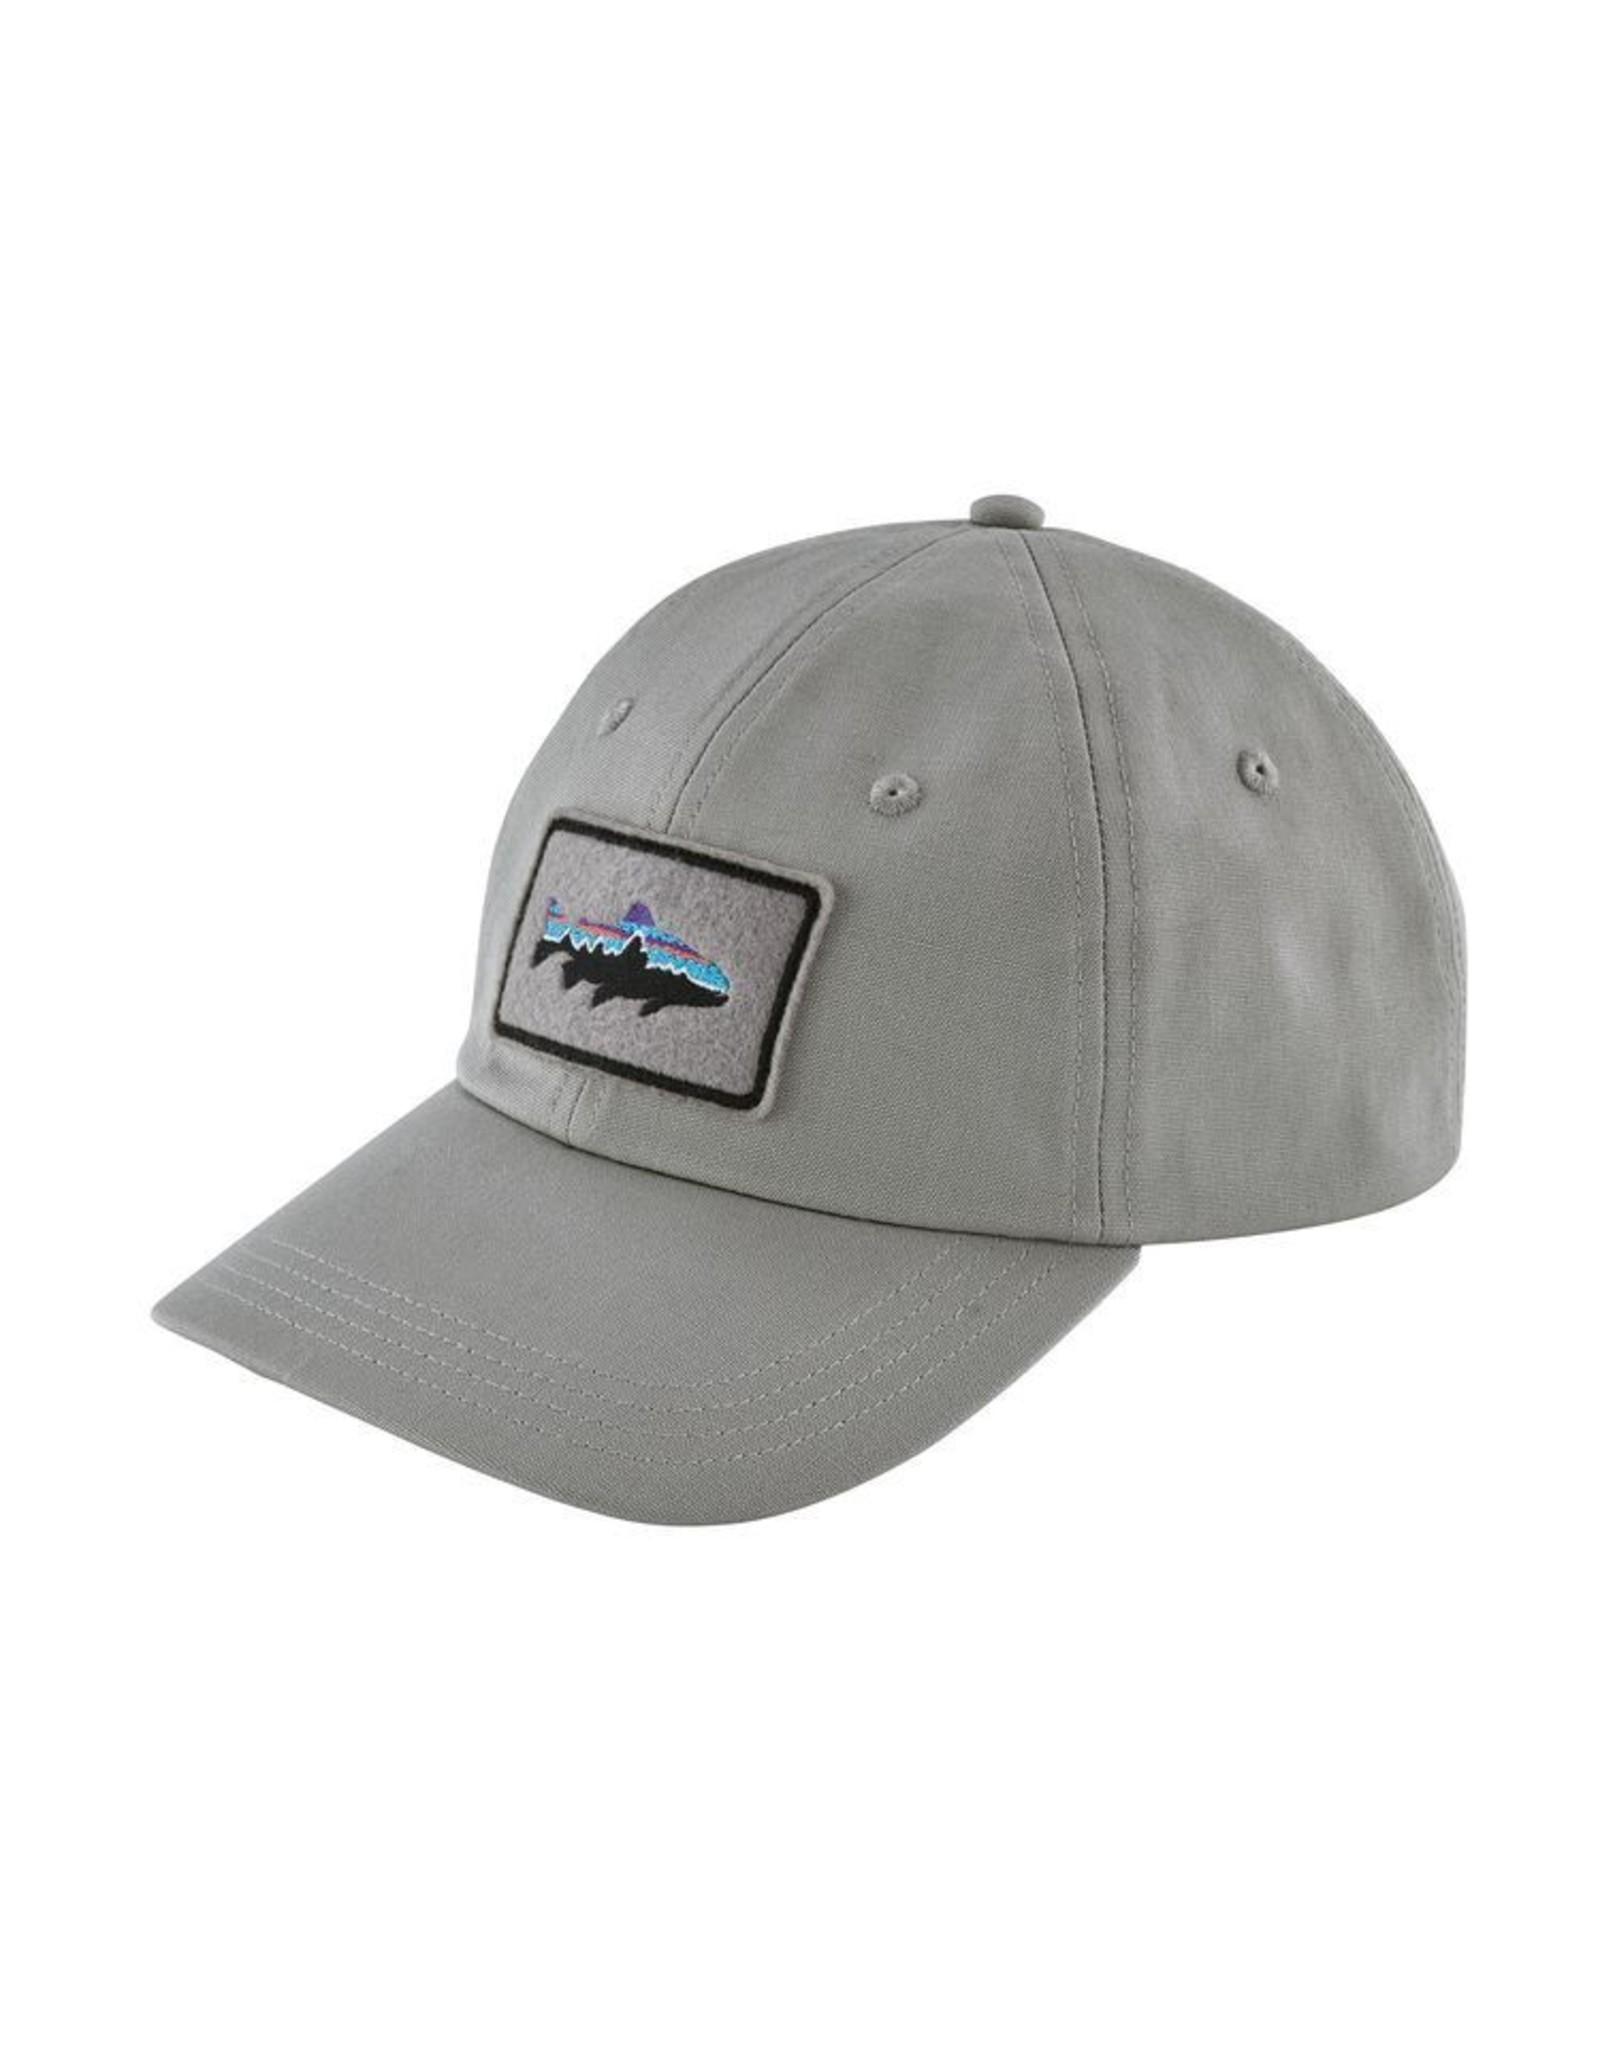 Patagonia Fitz Roy Trout Patch Terad Cap Drifter Grey RGA branded